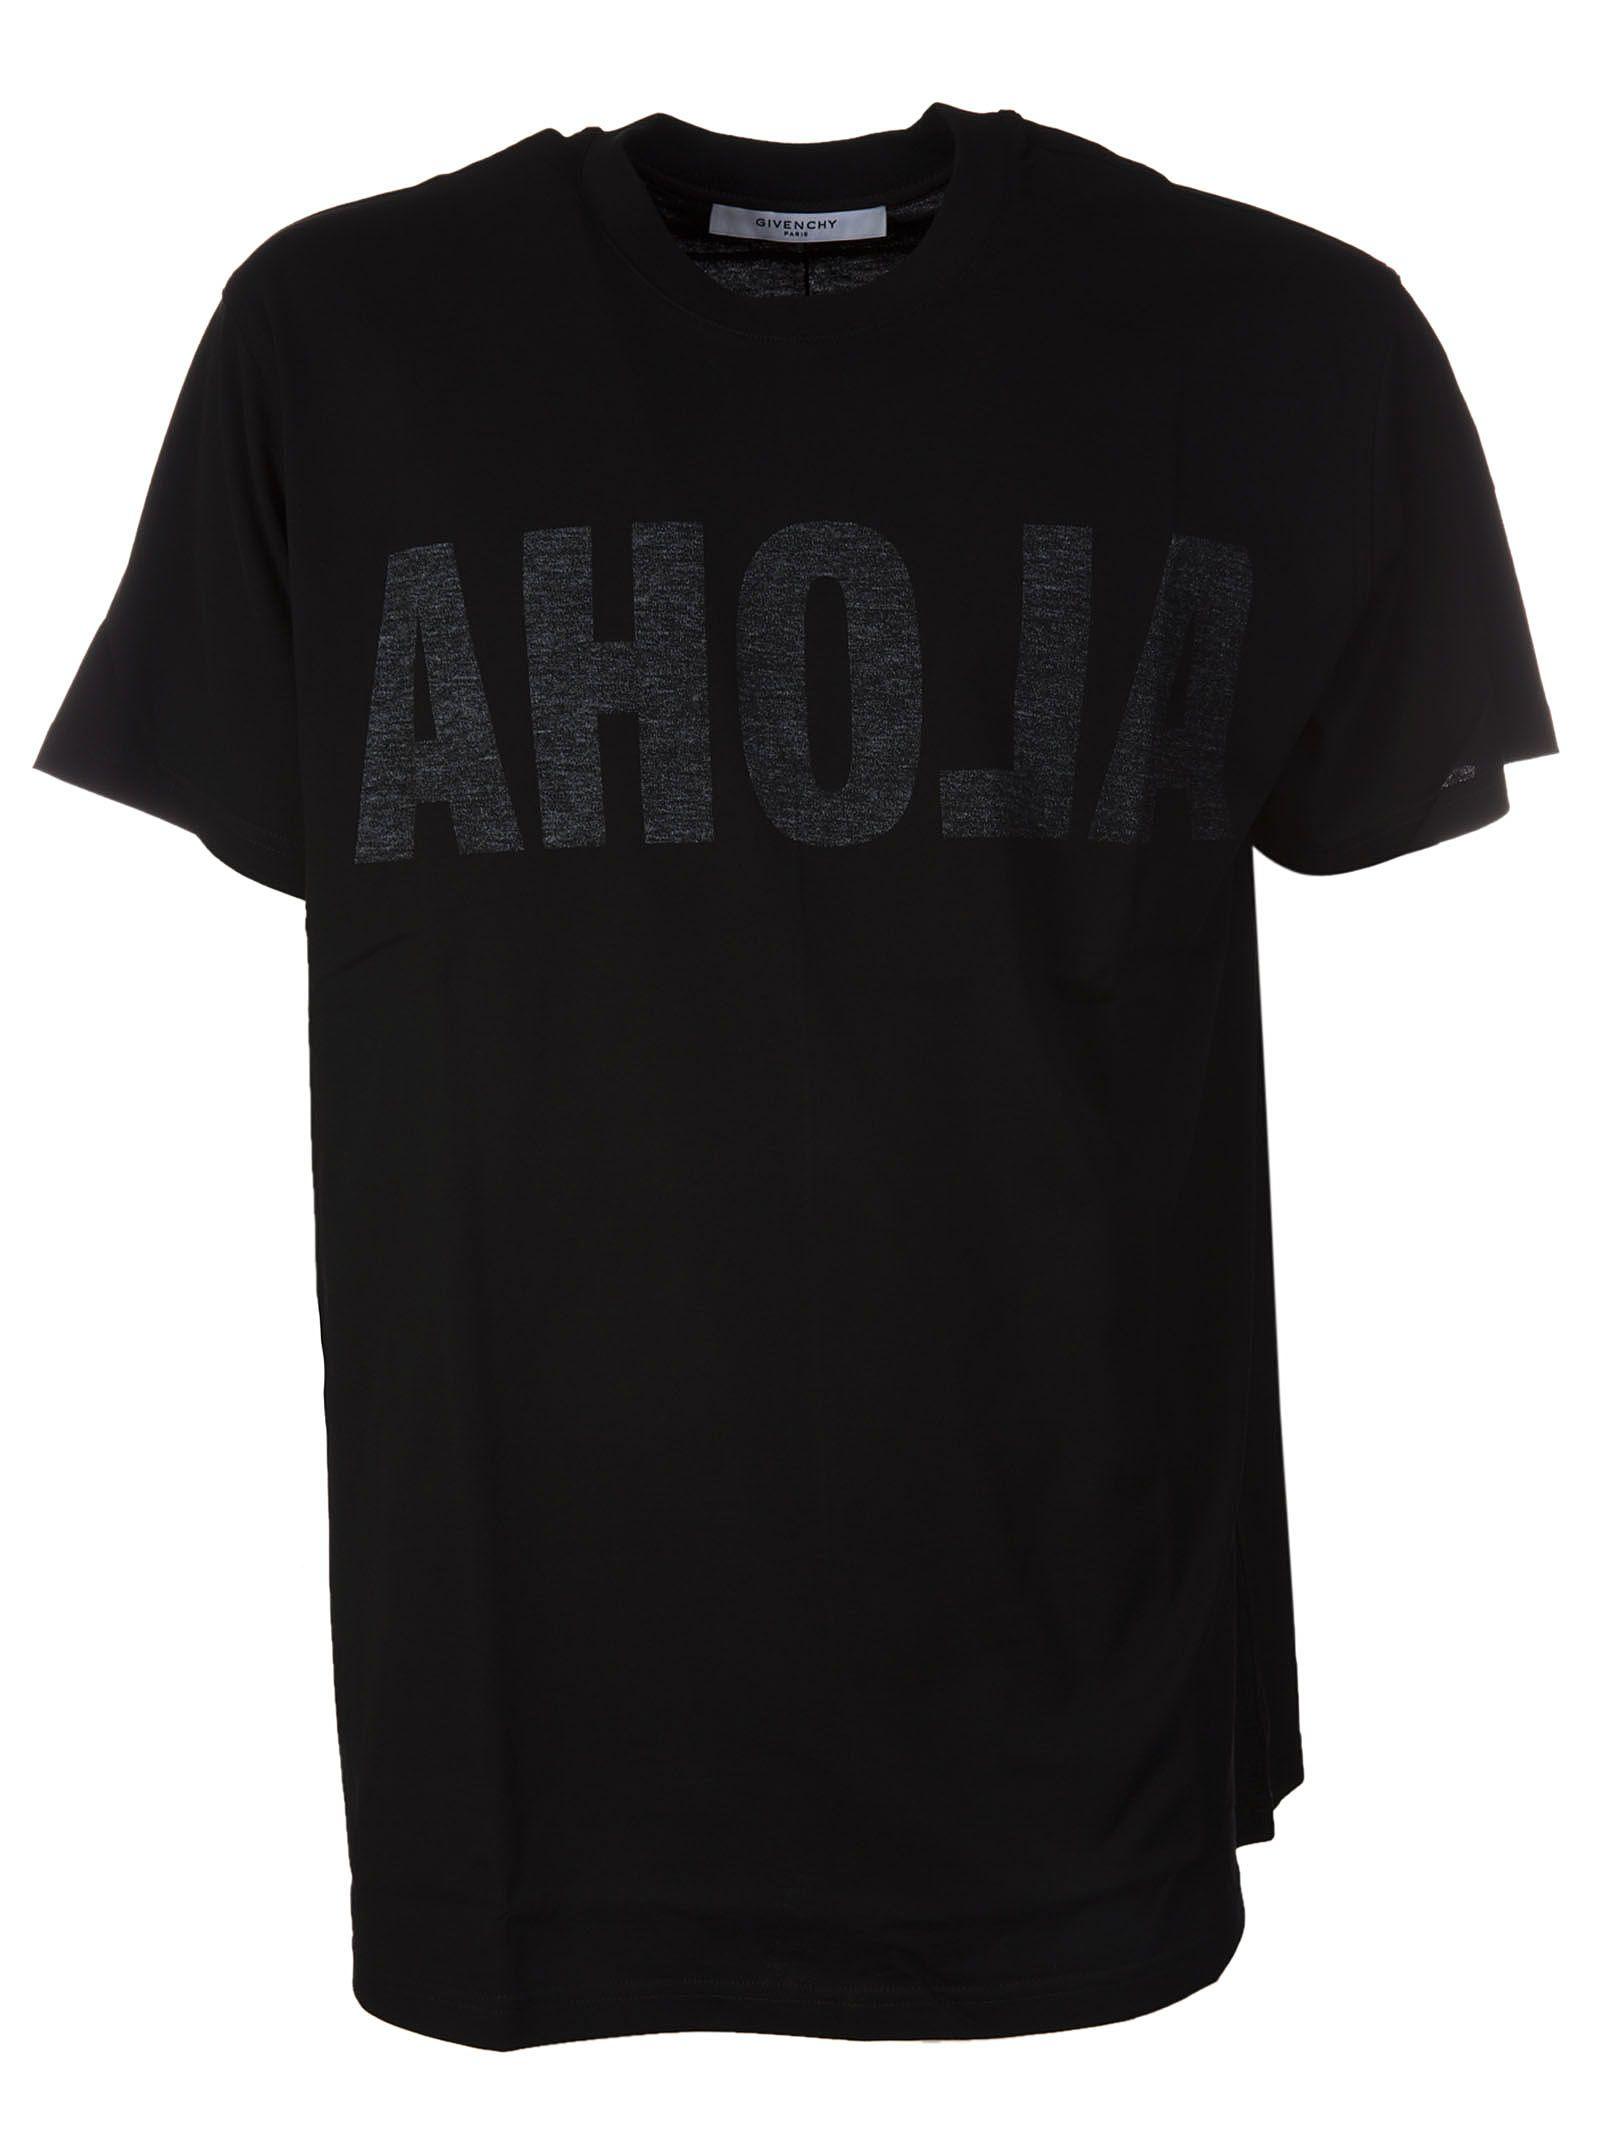 Givenchy Aloha T-shirt